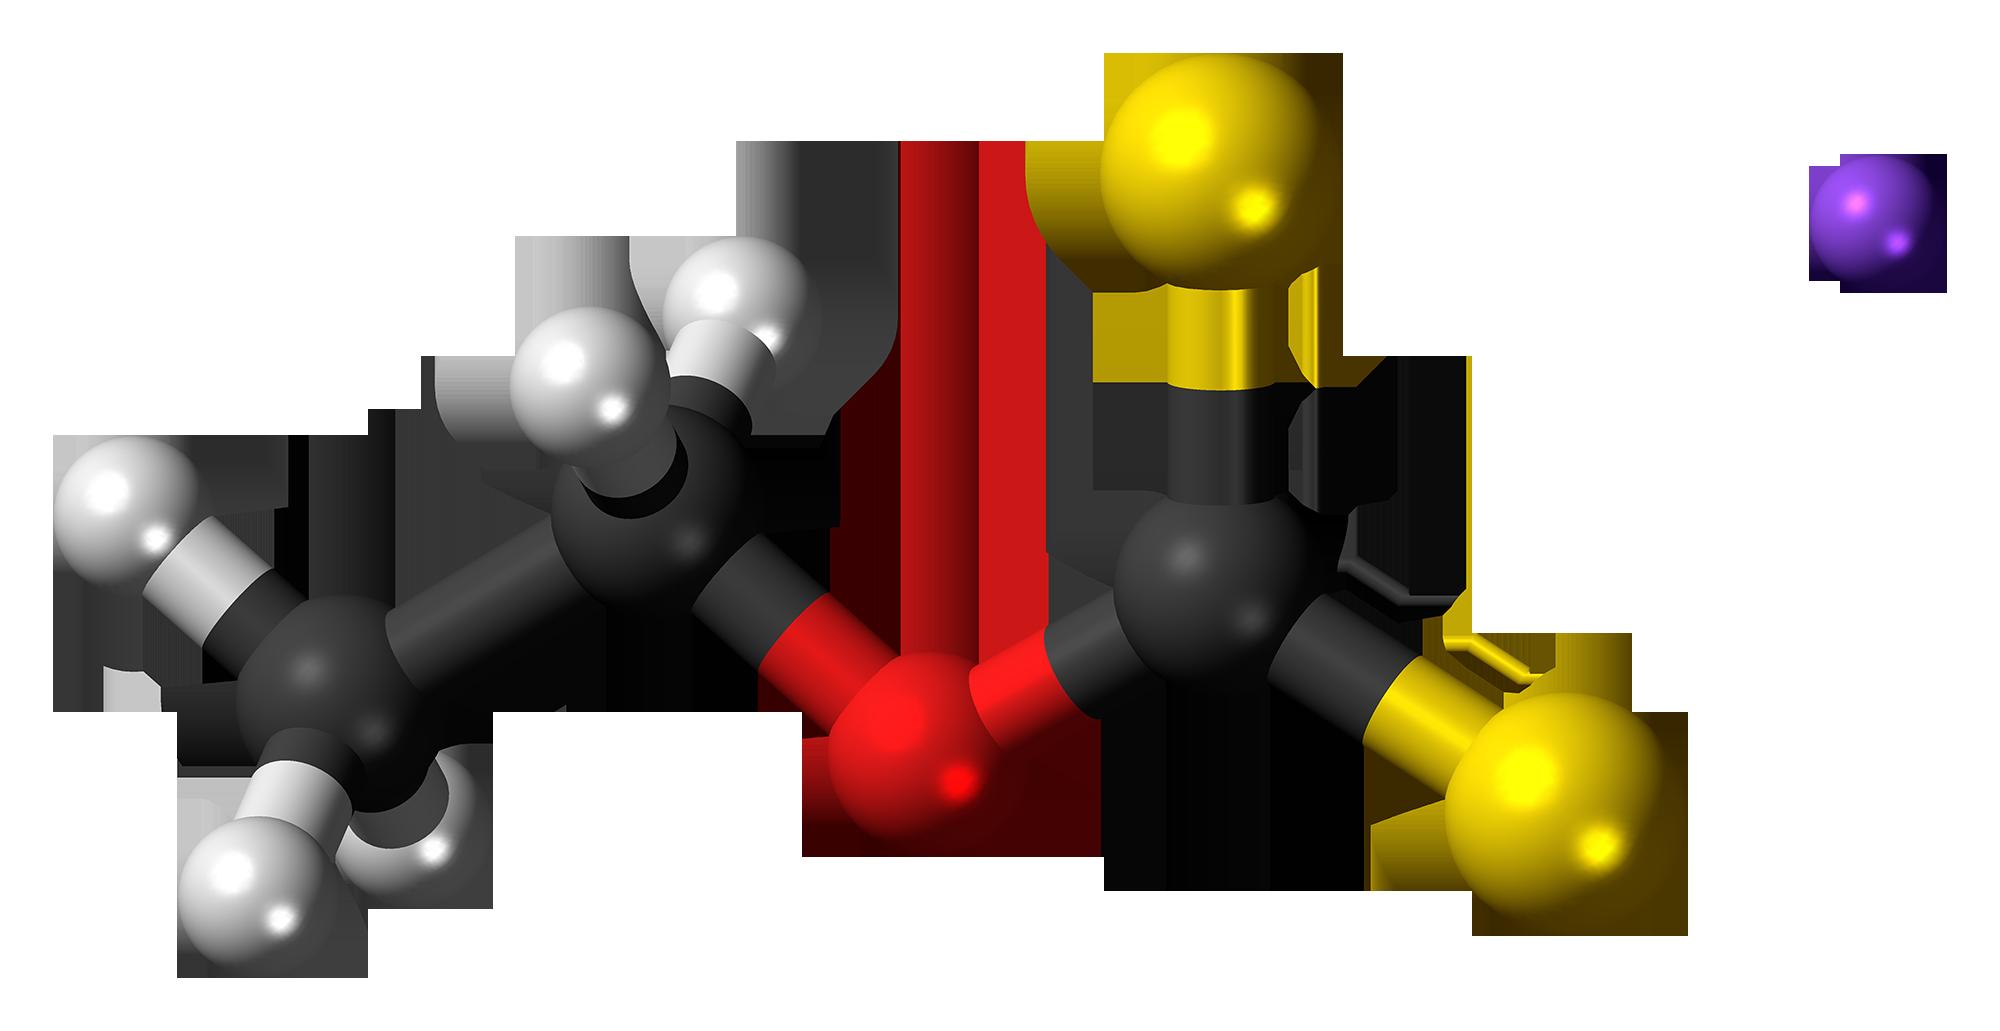 Sodium Ethyl Xanthate (SEX)